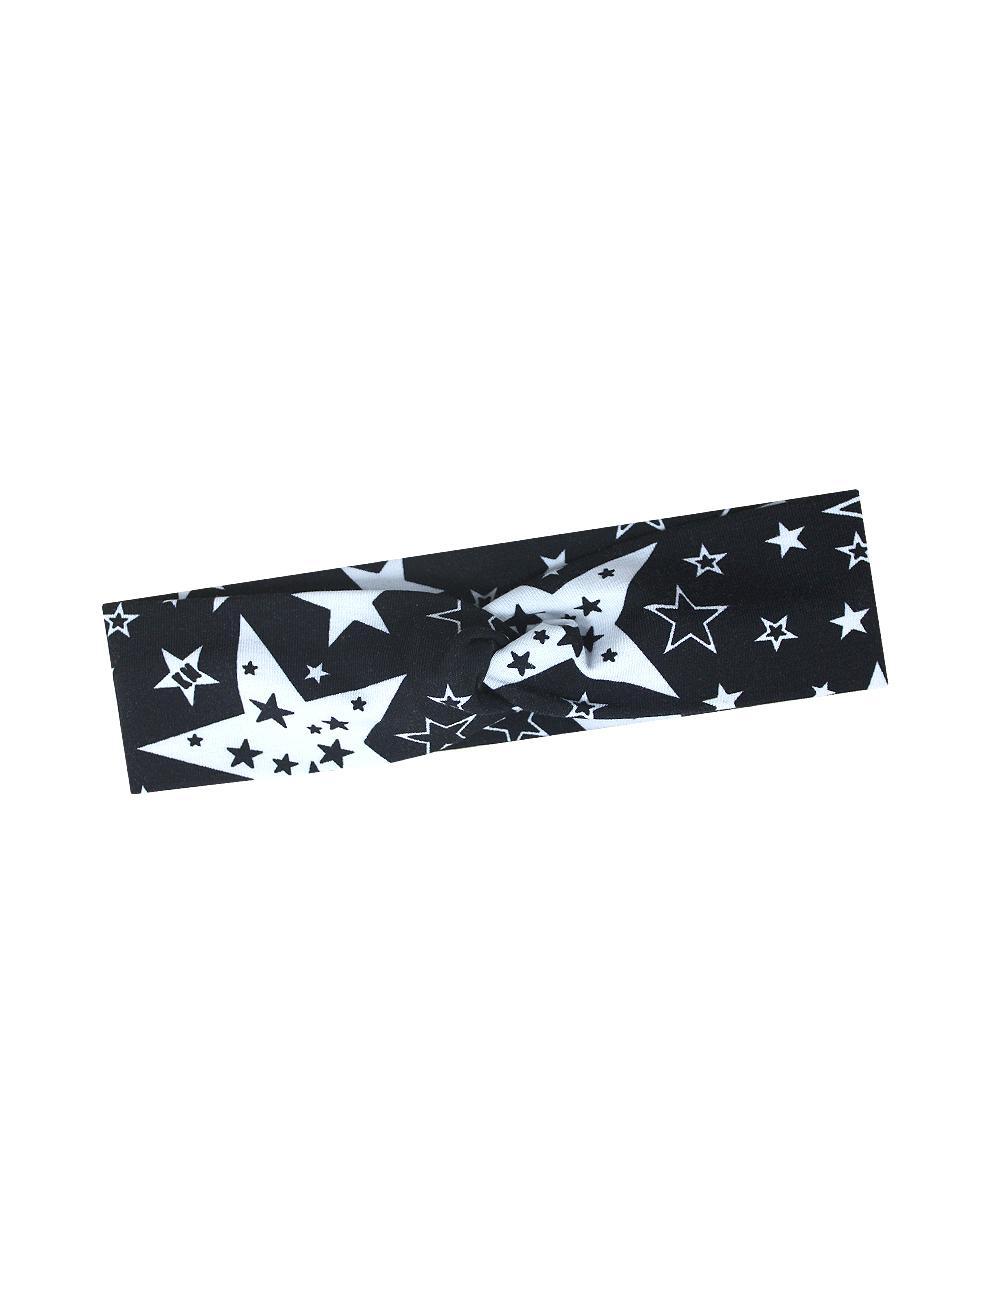 Повязка-бандана на голову KETMIN цв.STAR KM Чёрный